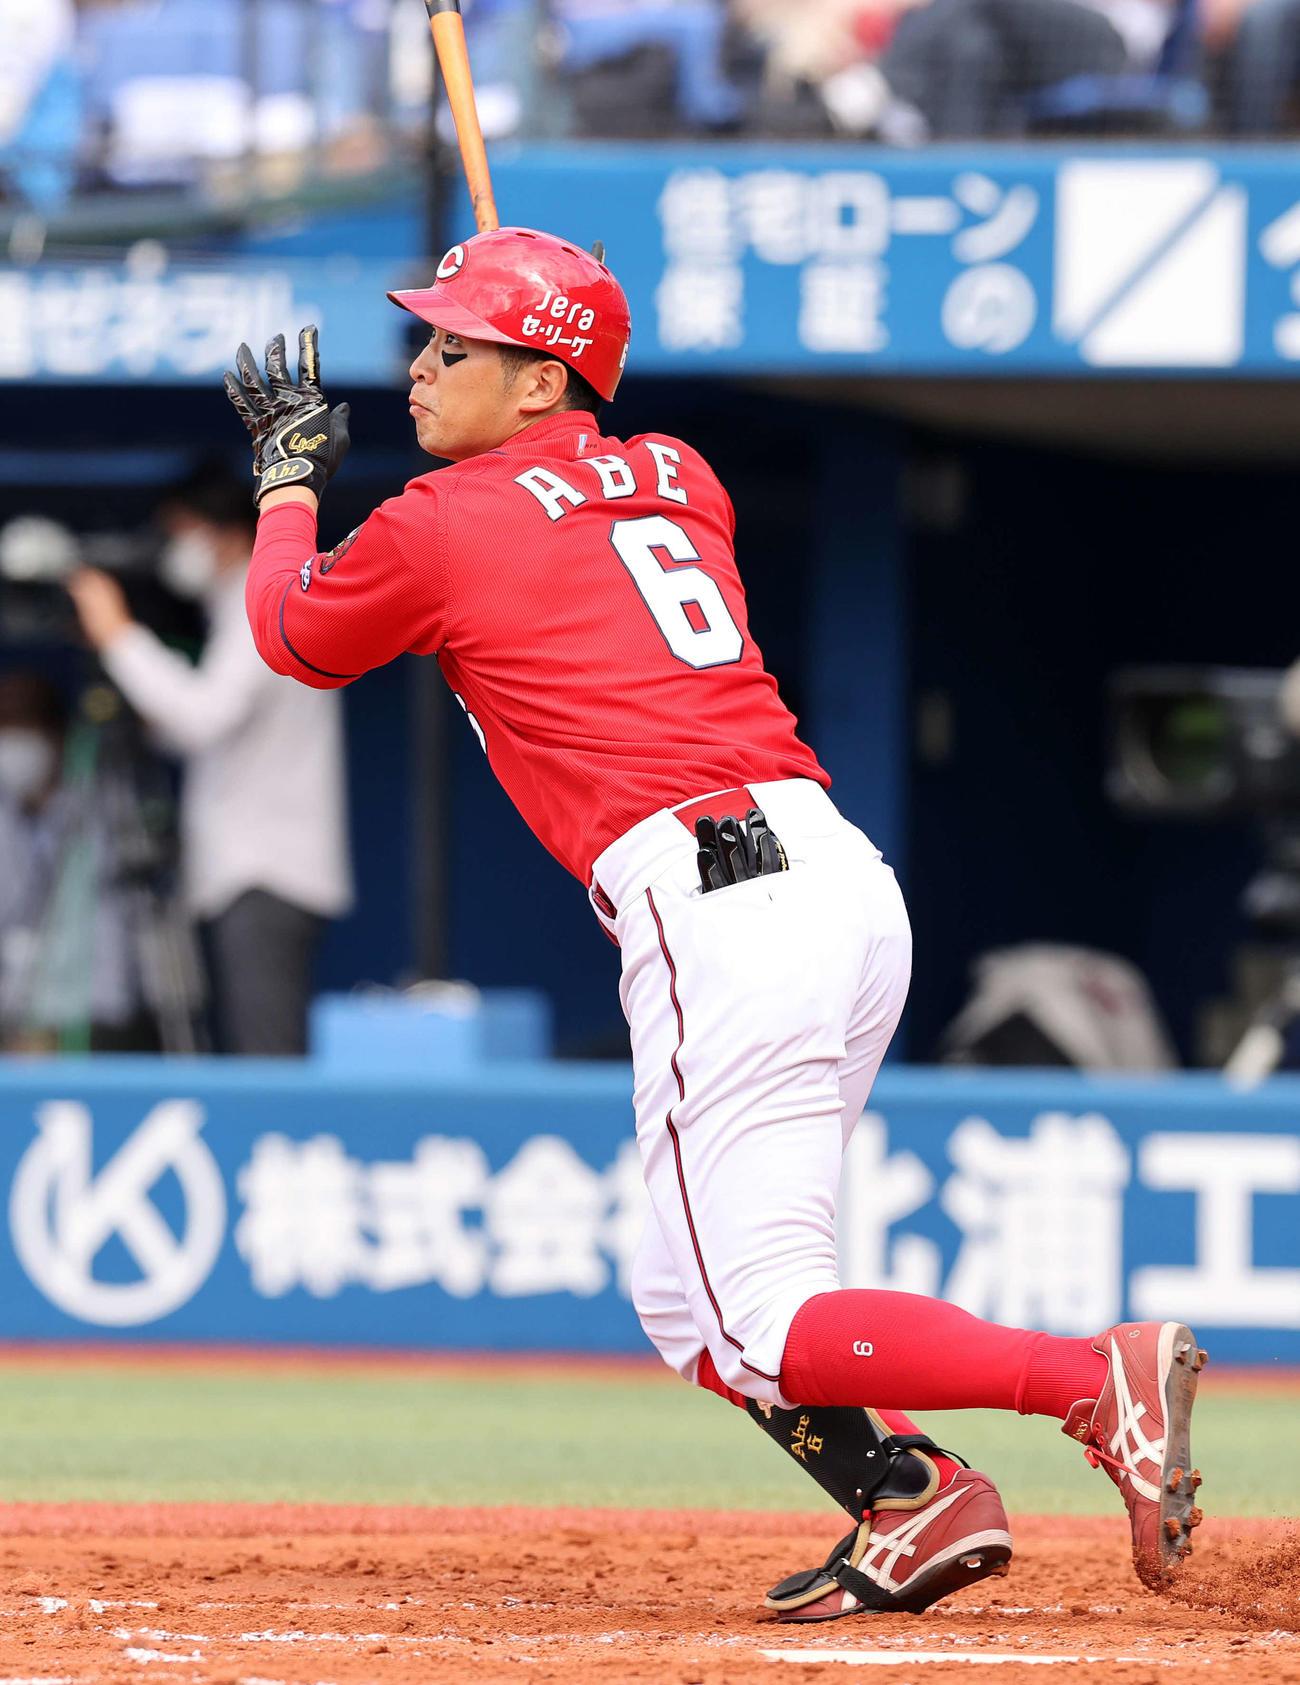 DeNA対広島 3回表広島無死、安部は左中間にソロ本塁打を放つ(撮影・鈴木正人)